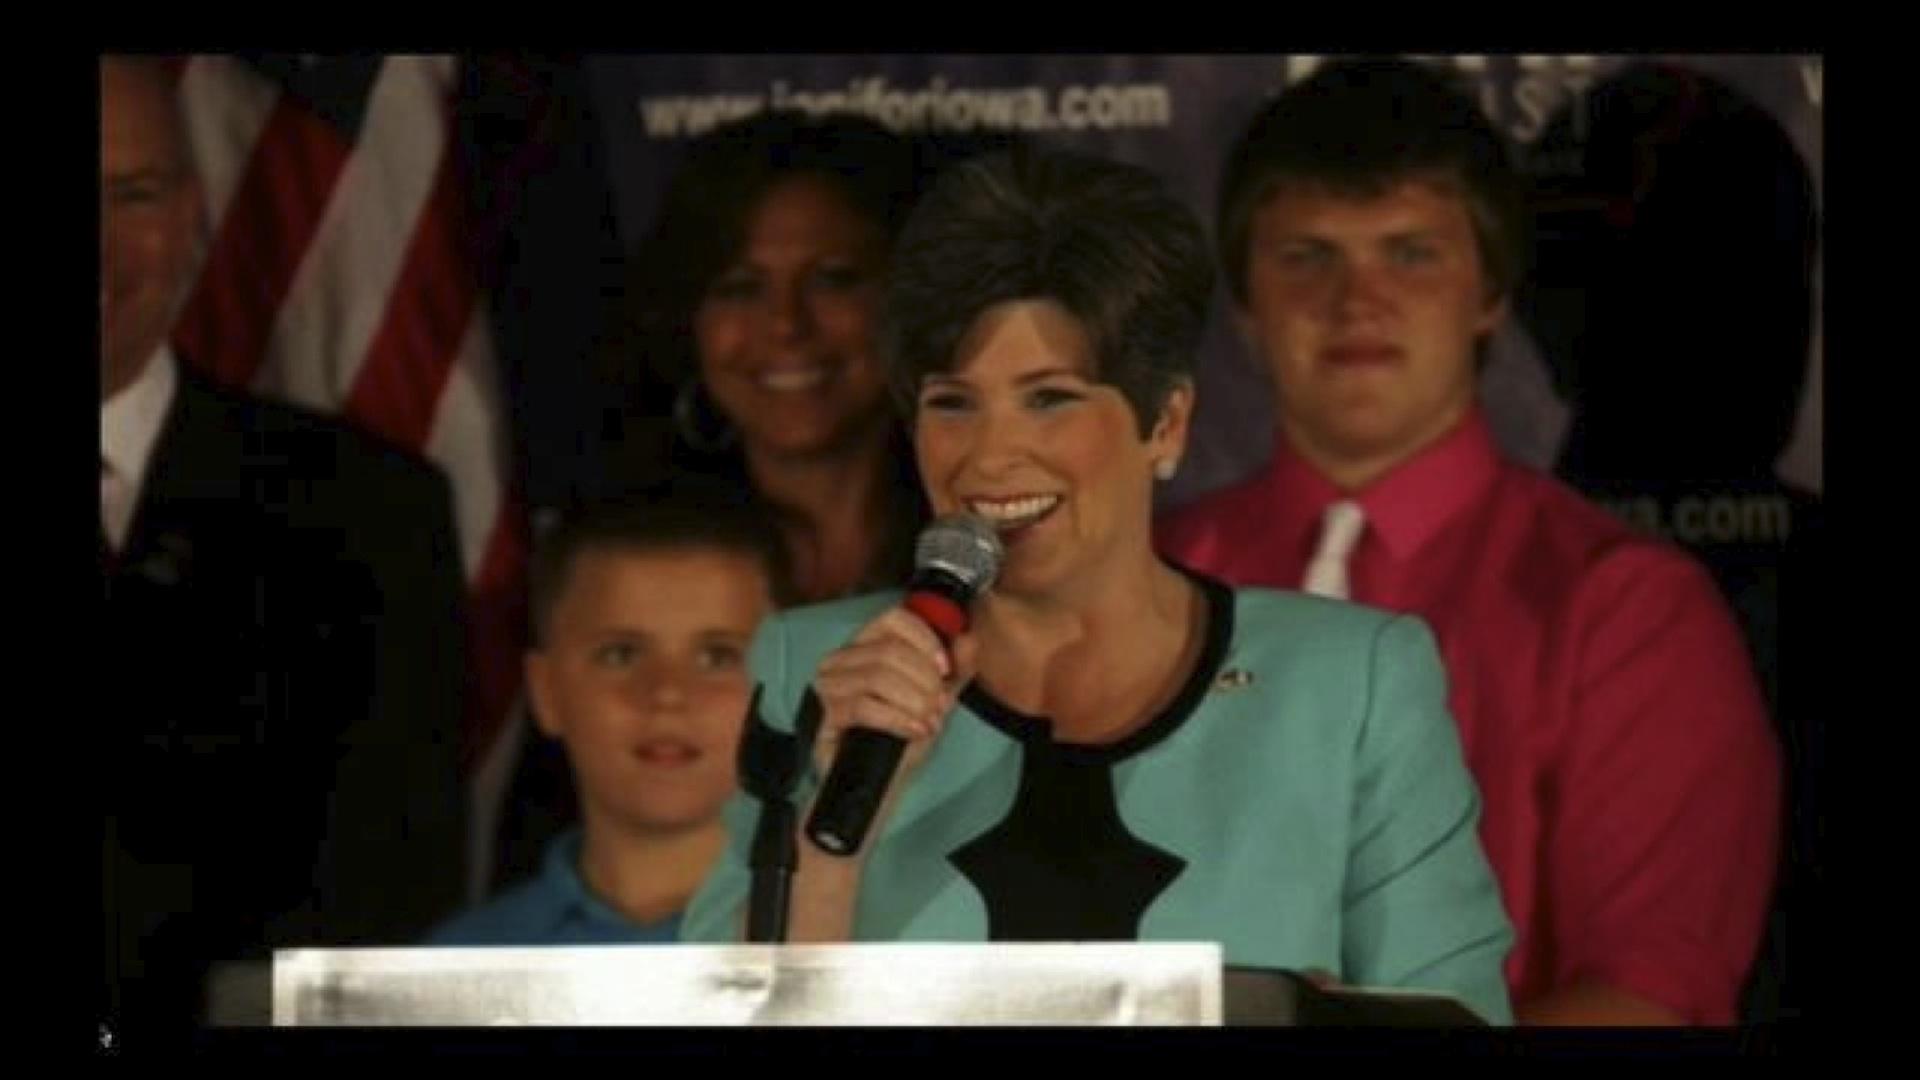 Joni Ernst, trumpeting 'the Iowa way,' shakes up her state